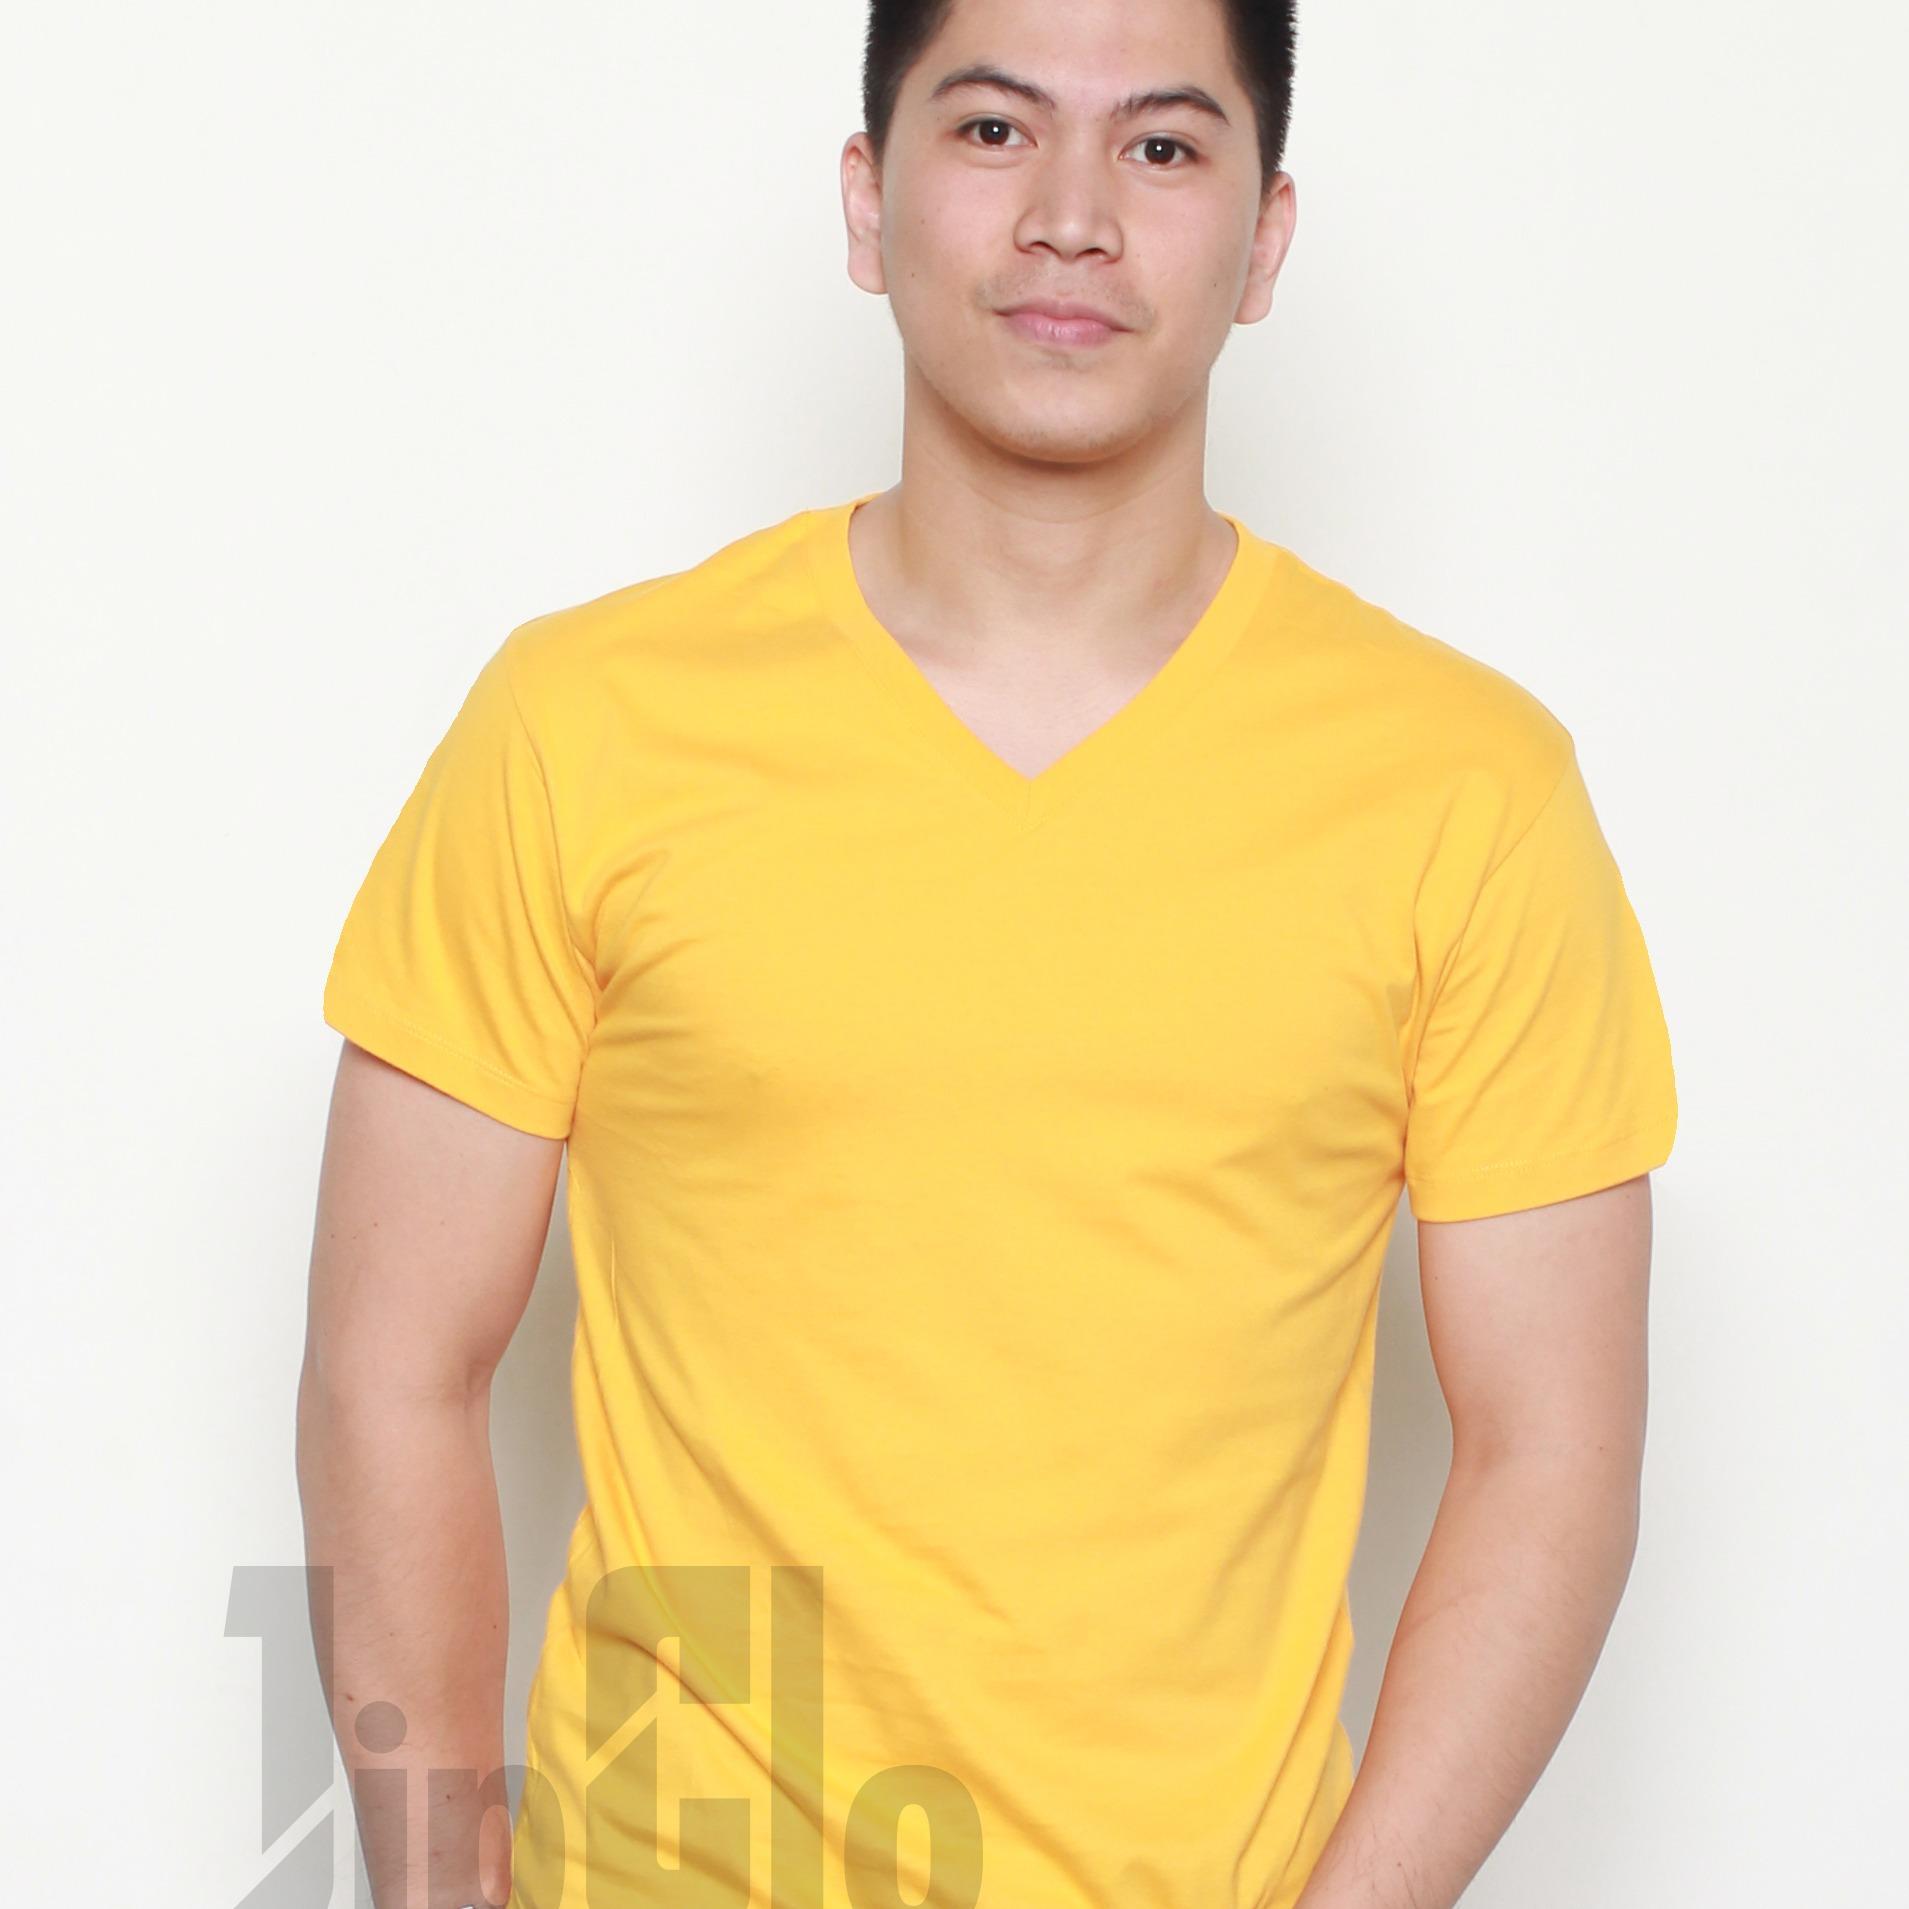 Harga Jual Sale New Arrival Kaos Polos Gildan Softstyle 63000 O Neck Nsa States Apparel 7260 Raglan Premium Original  Smlxl Oblong 30s Pria Warna Kuning V Lengan Pendek T Shirt